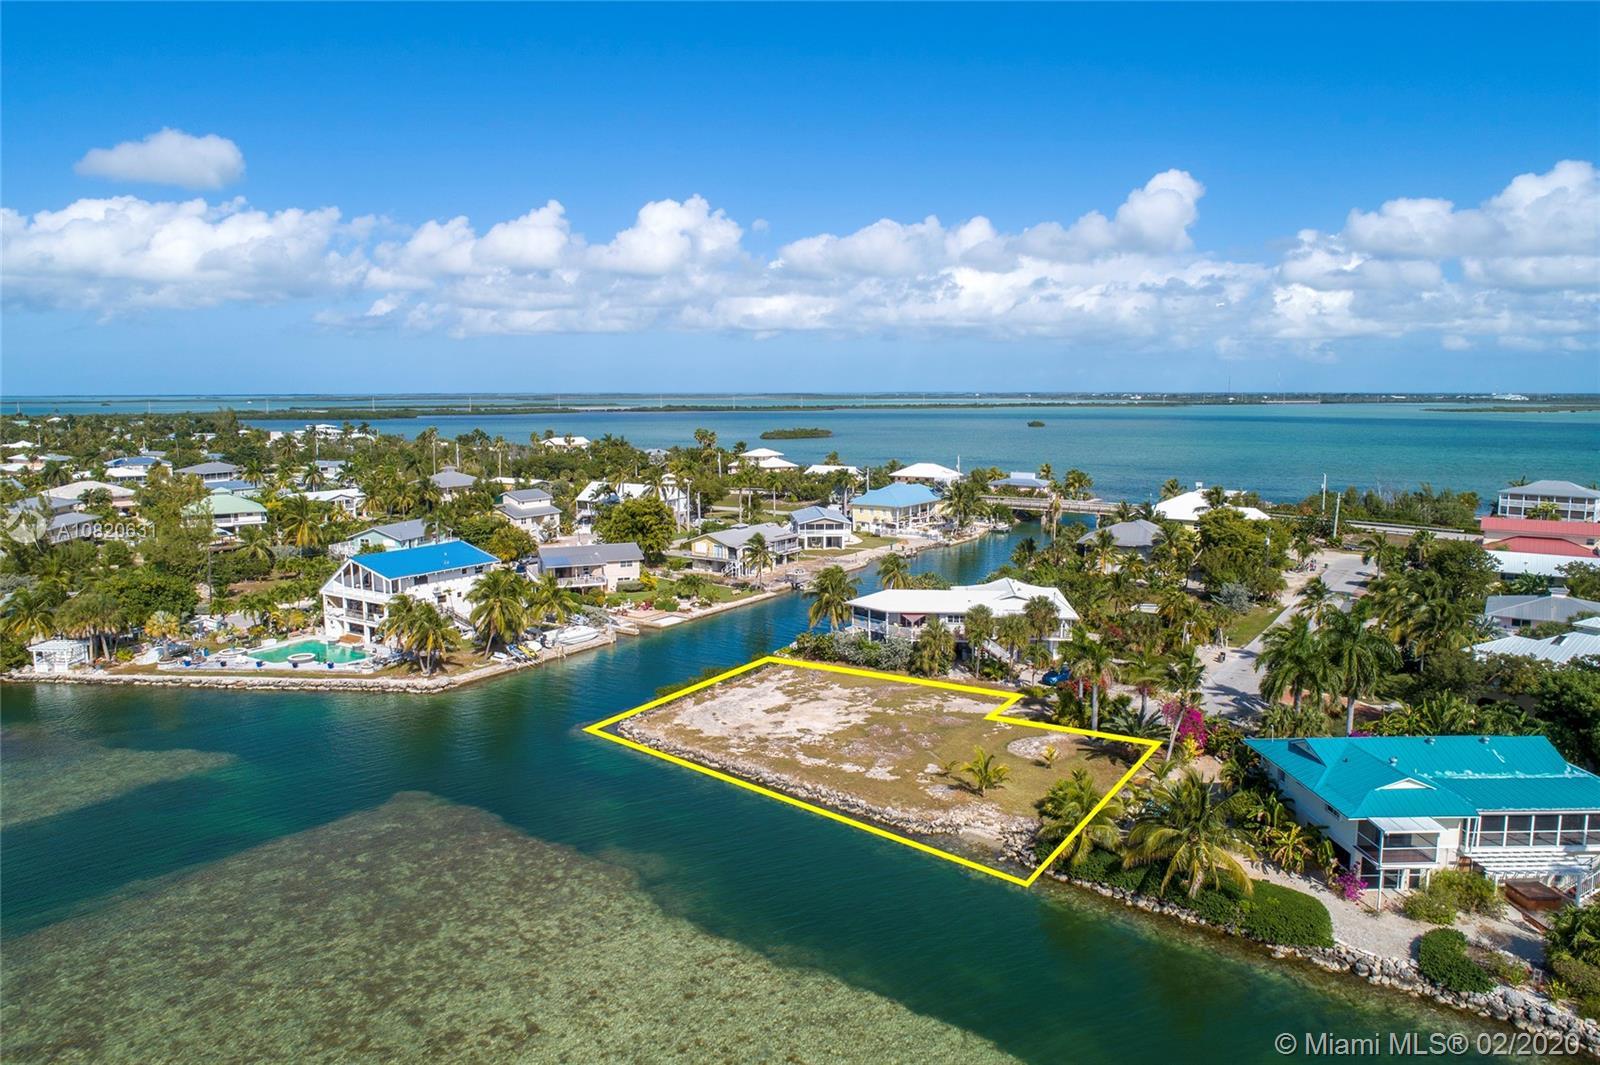 17111 Seagrape Ln, Sugarloaf, FL 33042 - Sugarloaf, FL real estate listing